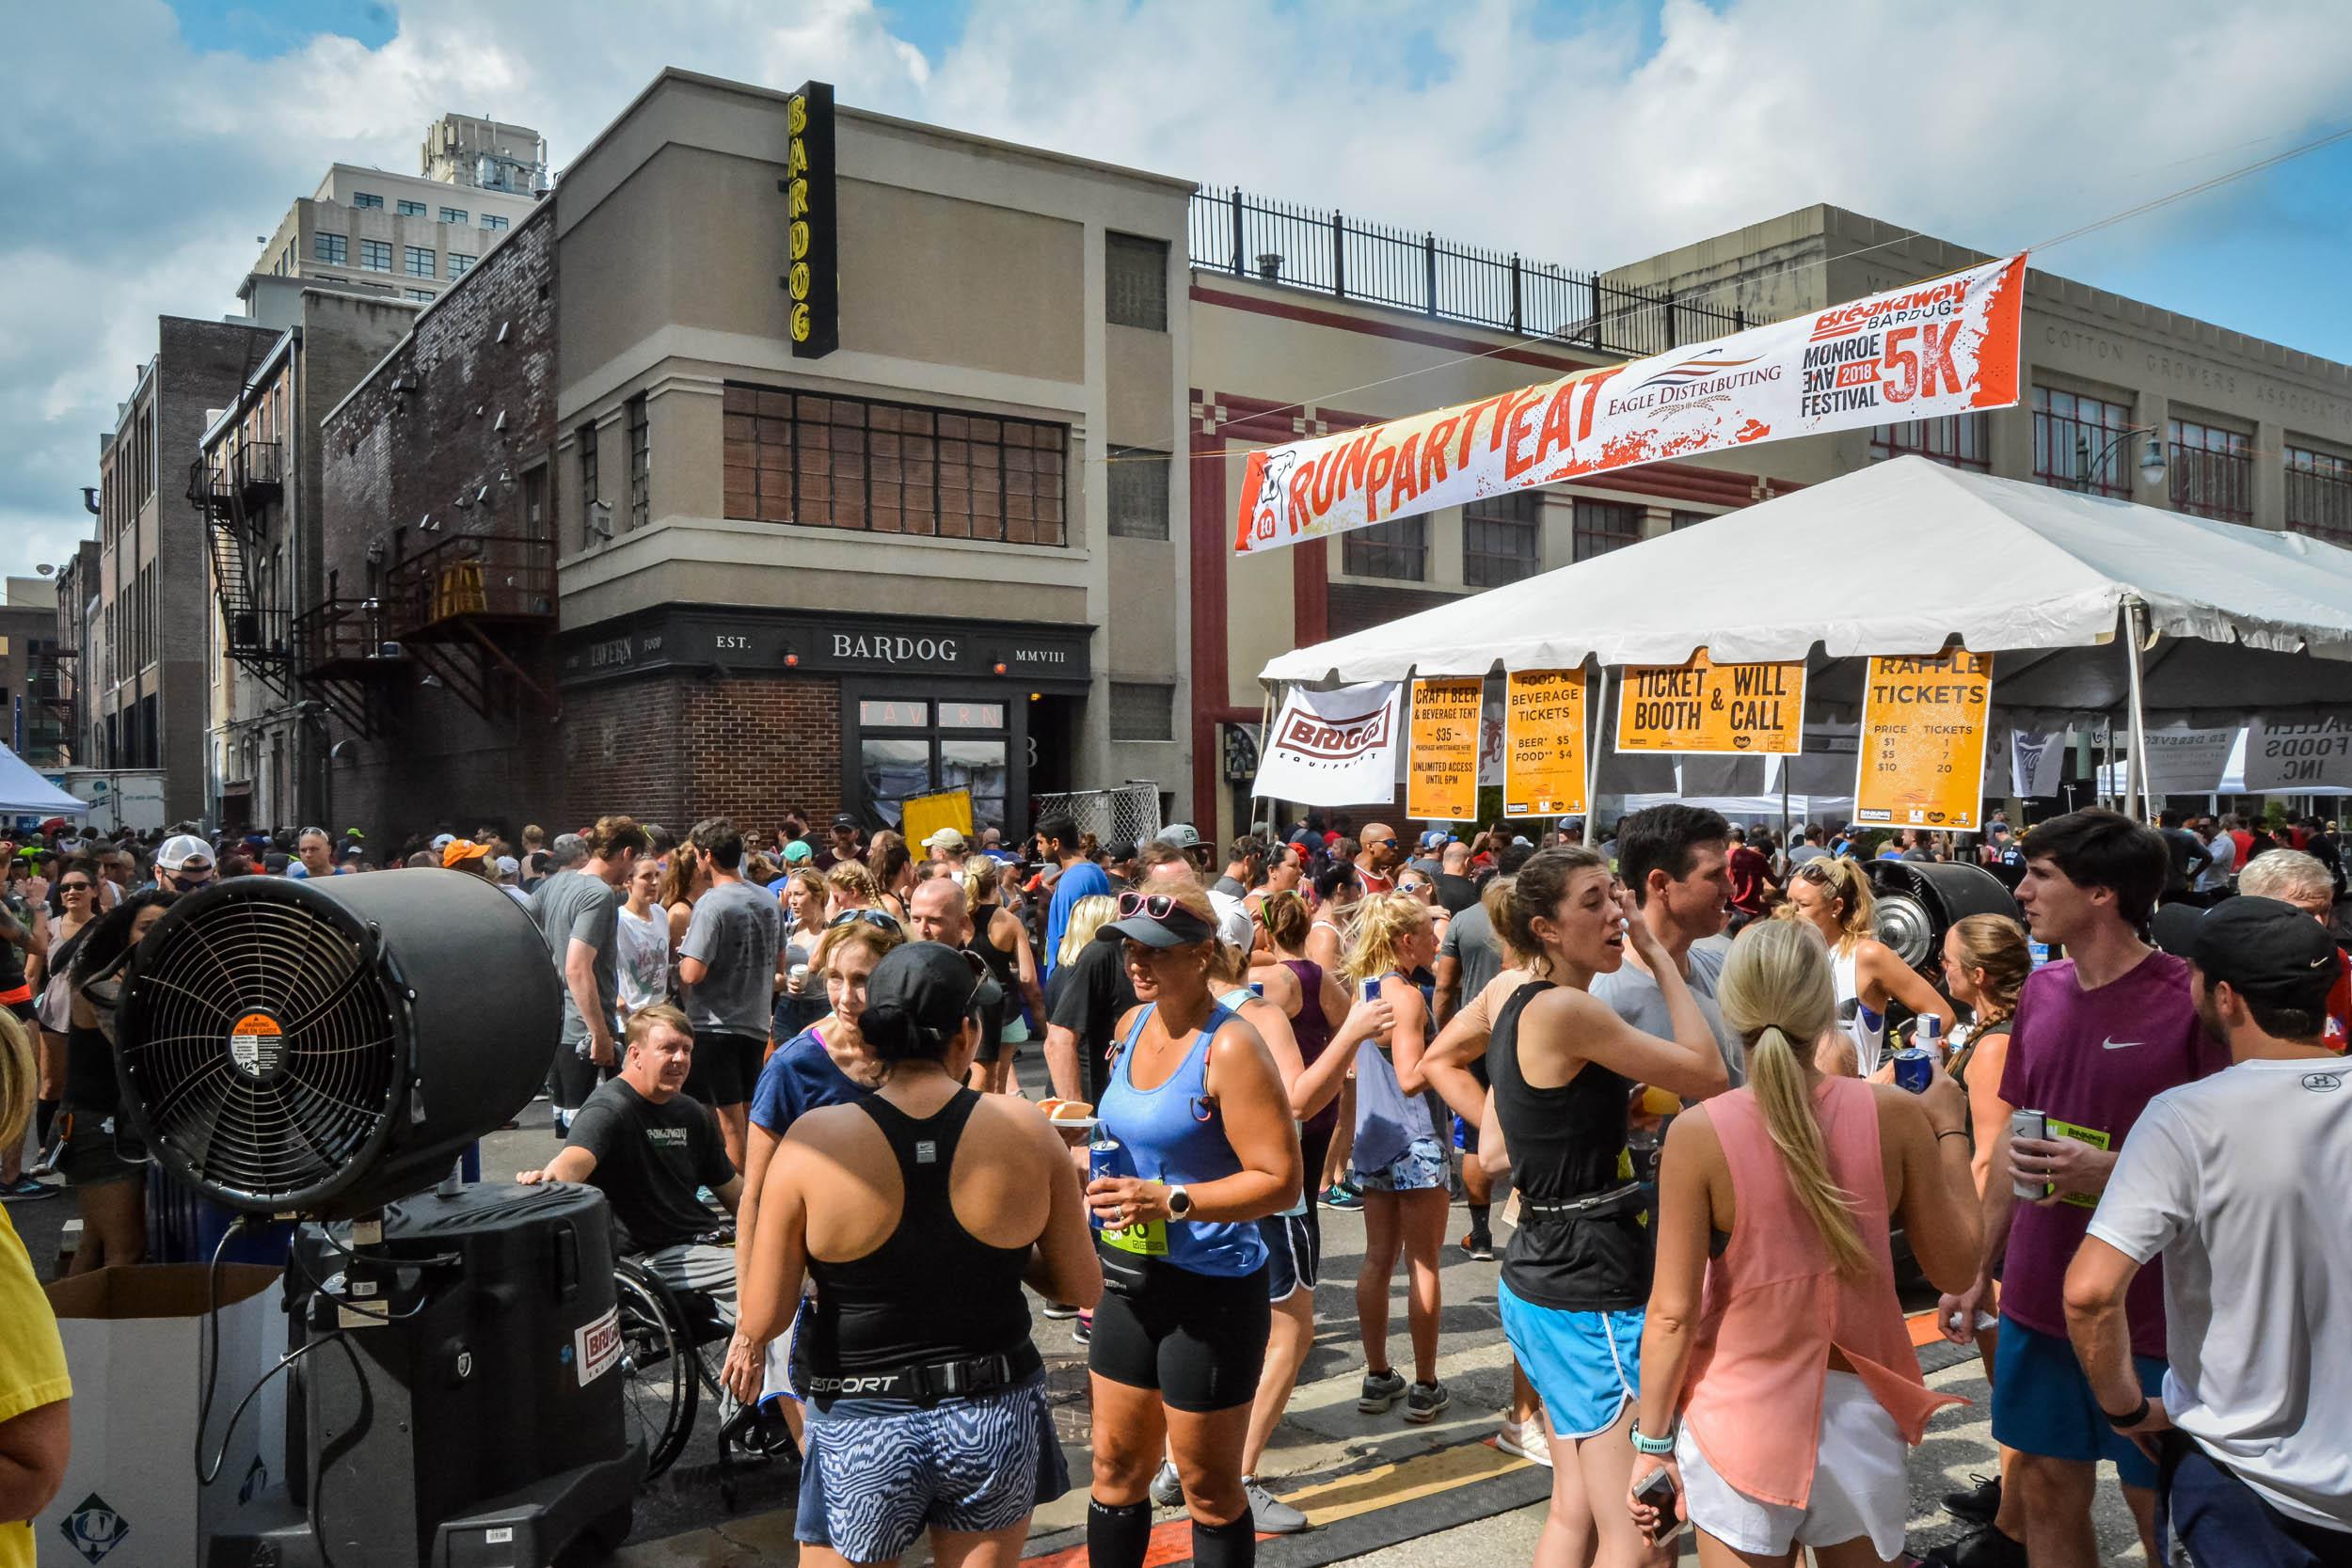 Monroe Avenue Festival Bardog Block Party 0058.jpg